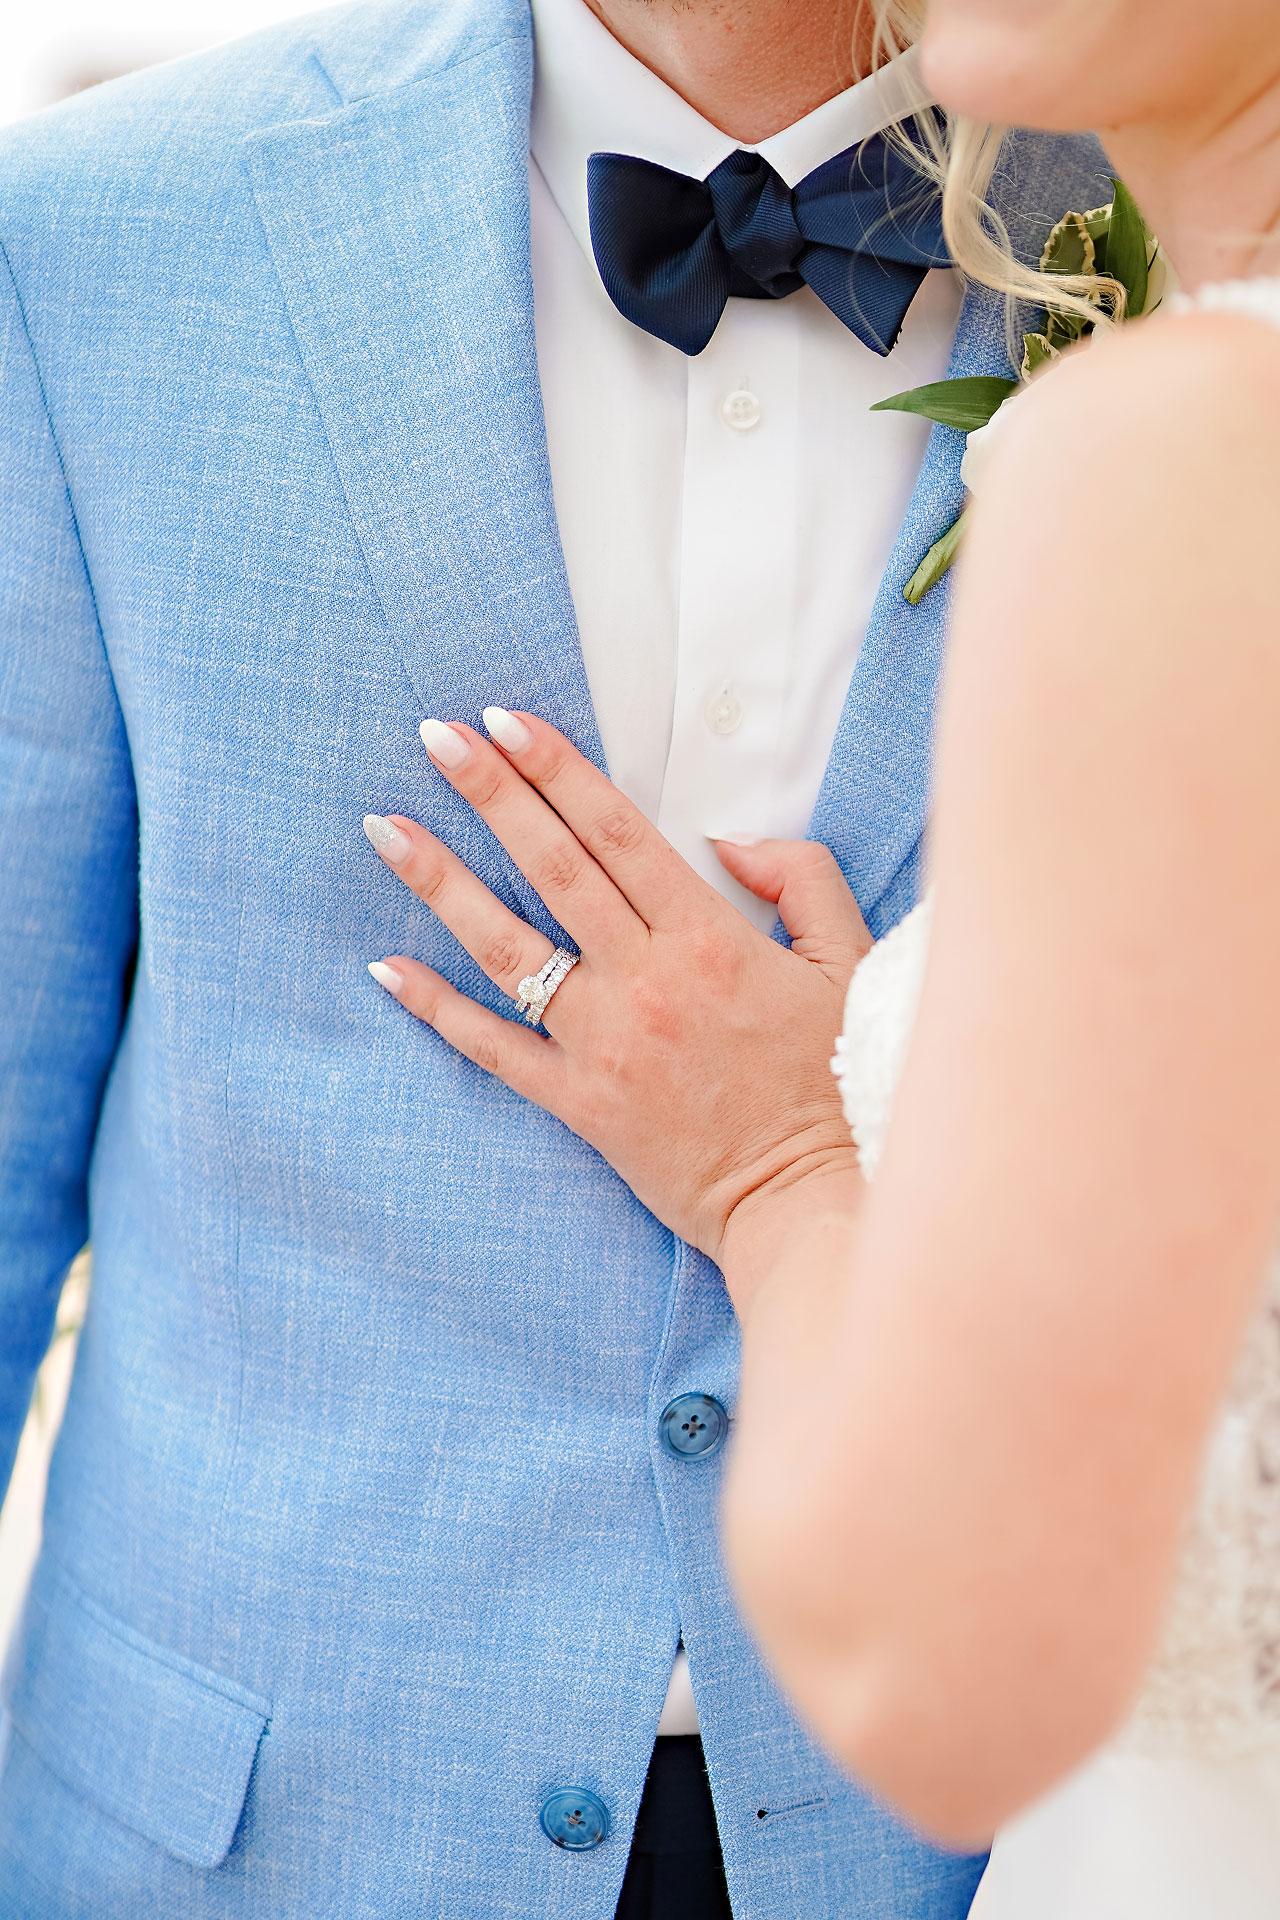 Sammi Jack Regions Tower JPS Events Indianapolis Wedding 209